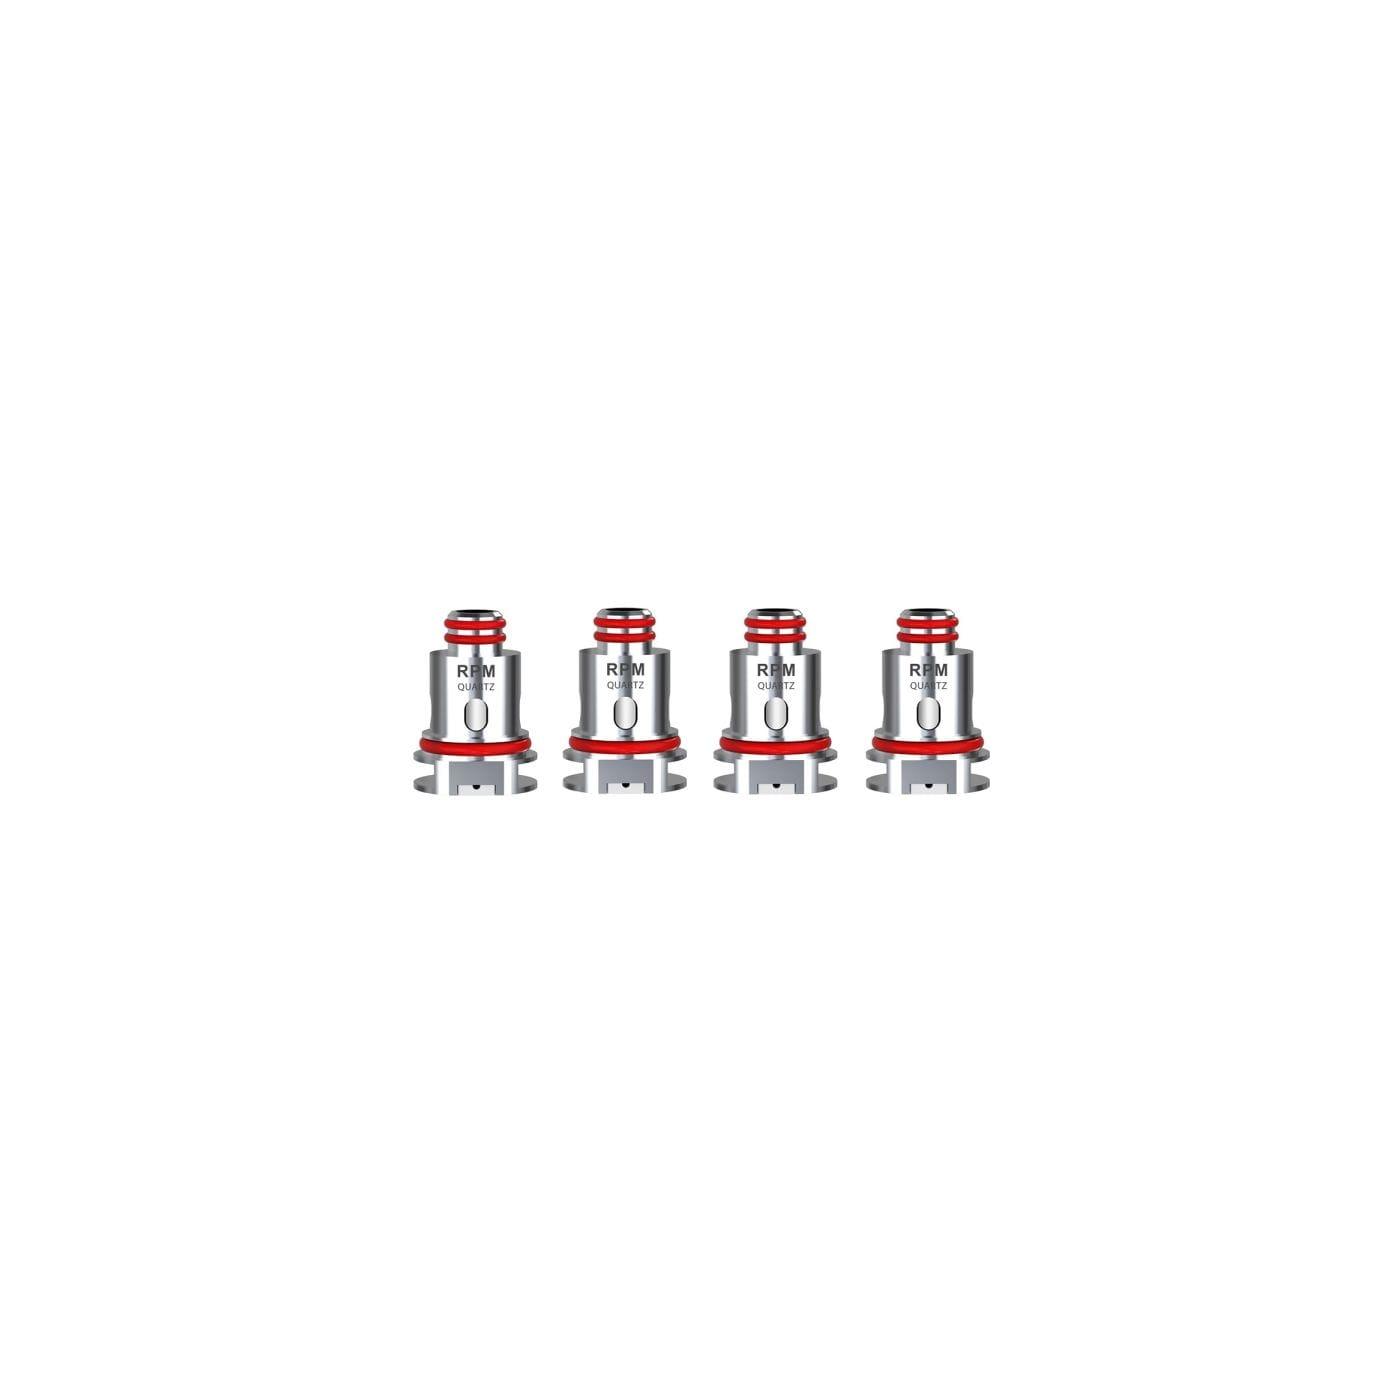 Smok RPM Quartz Replacement Coil - 5 Pack